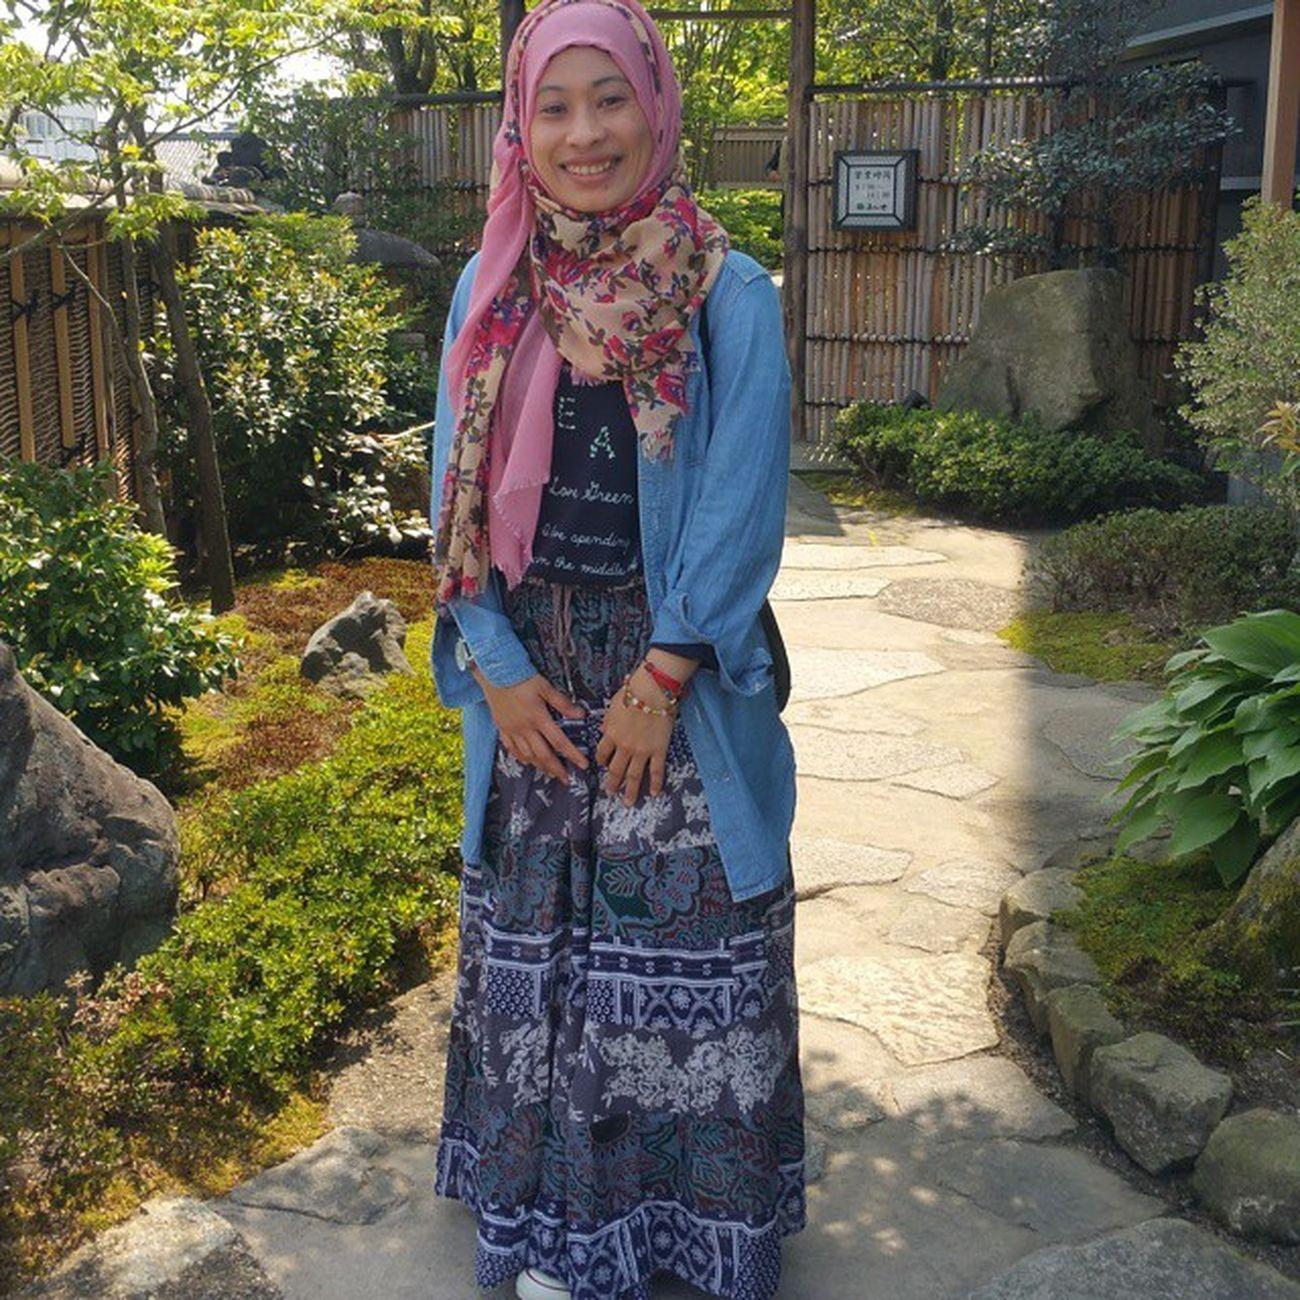 Ke caffe teh jg kebun teh hijau Macha Aiyamacha Cafetea Tehhijau Japan Muslim Musliminjapan Hijabmuslimah Hijab Livinginjapan Nishio Aichi Lovejapan Nikkeiijin Aceh Acehjapan Indonesiajapan